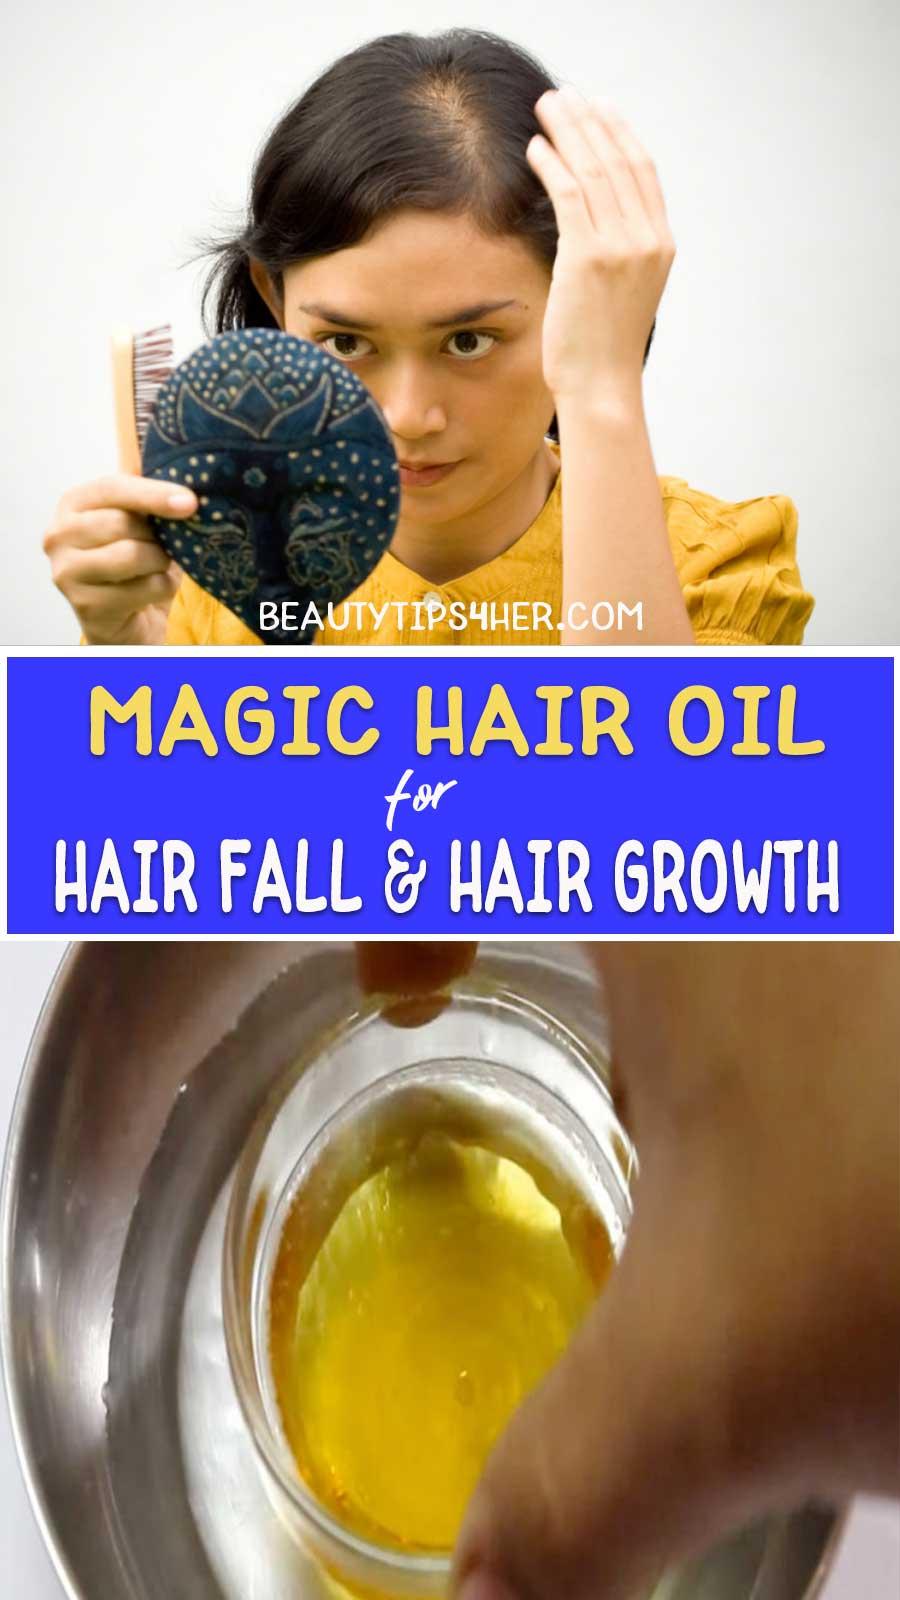 Hair oil for hair fall and hair growth